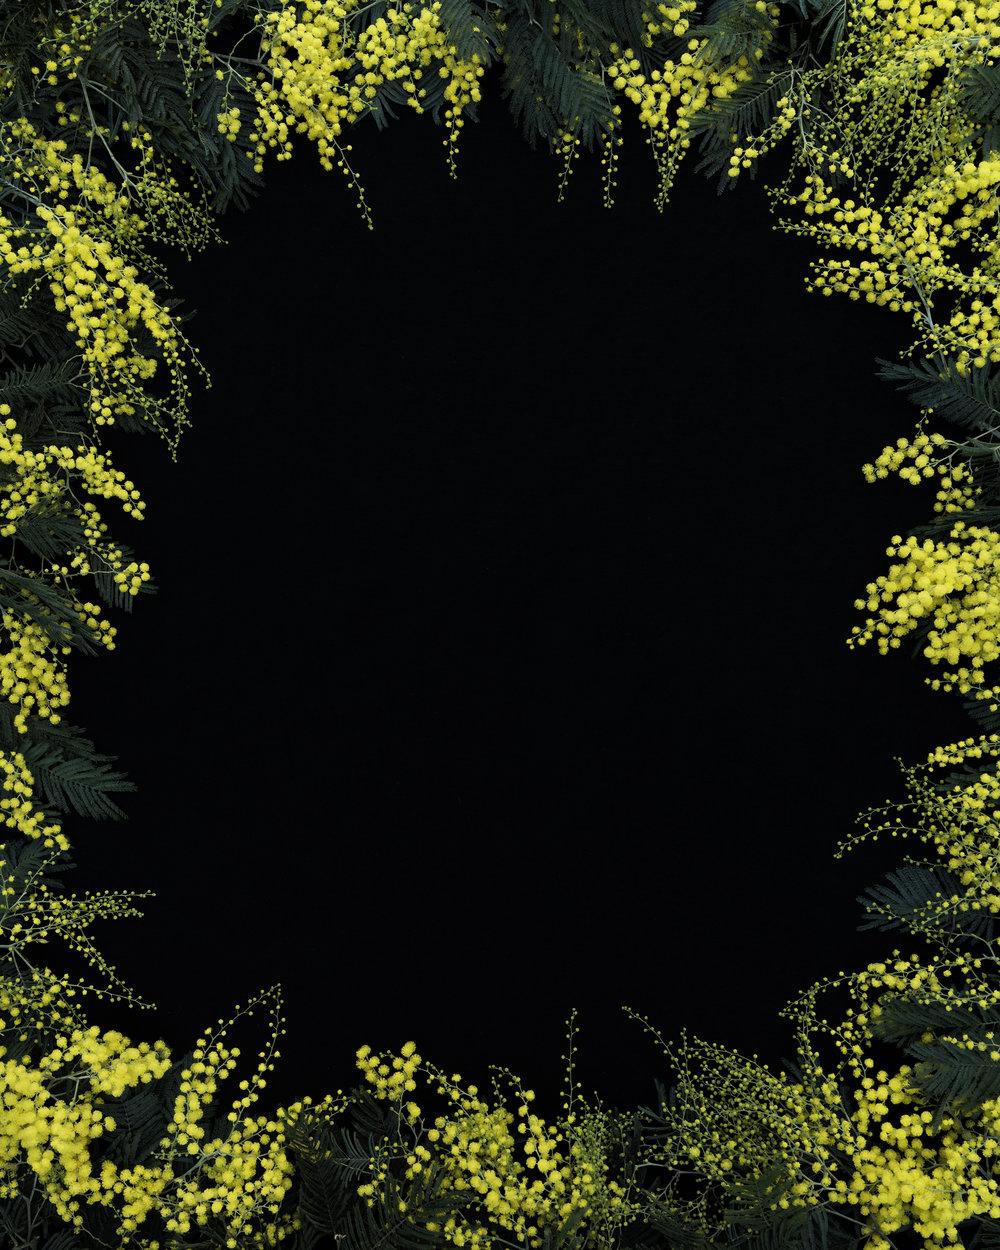 J. John Priola,  Acacia Flowers,  2018